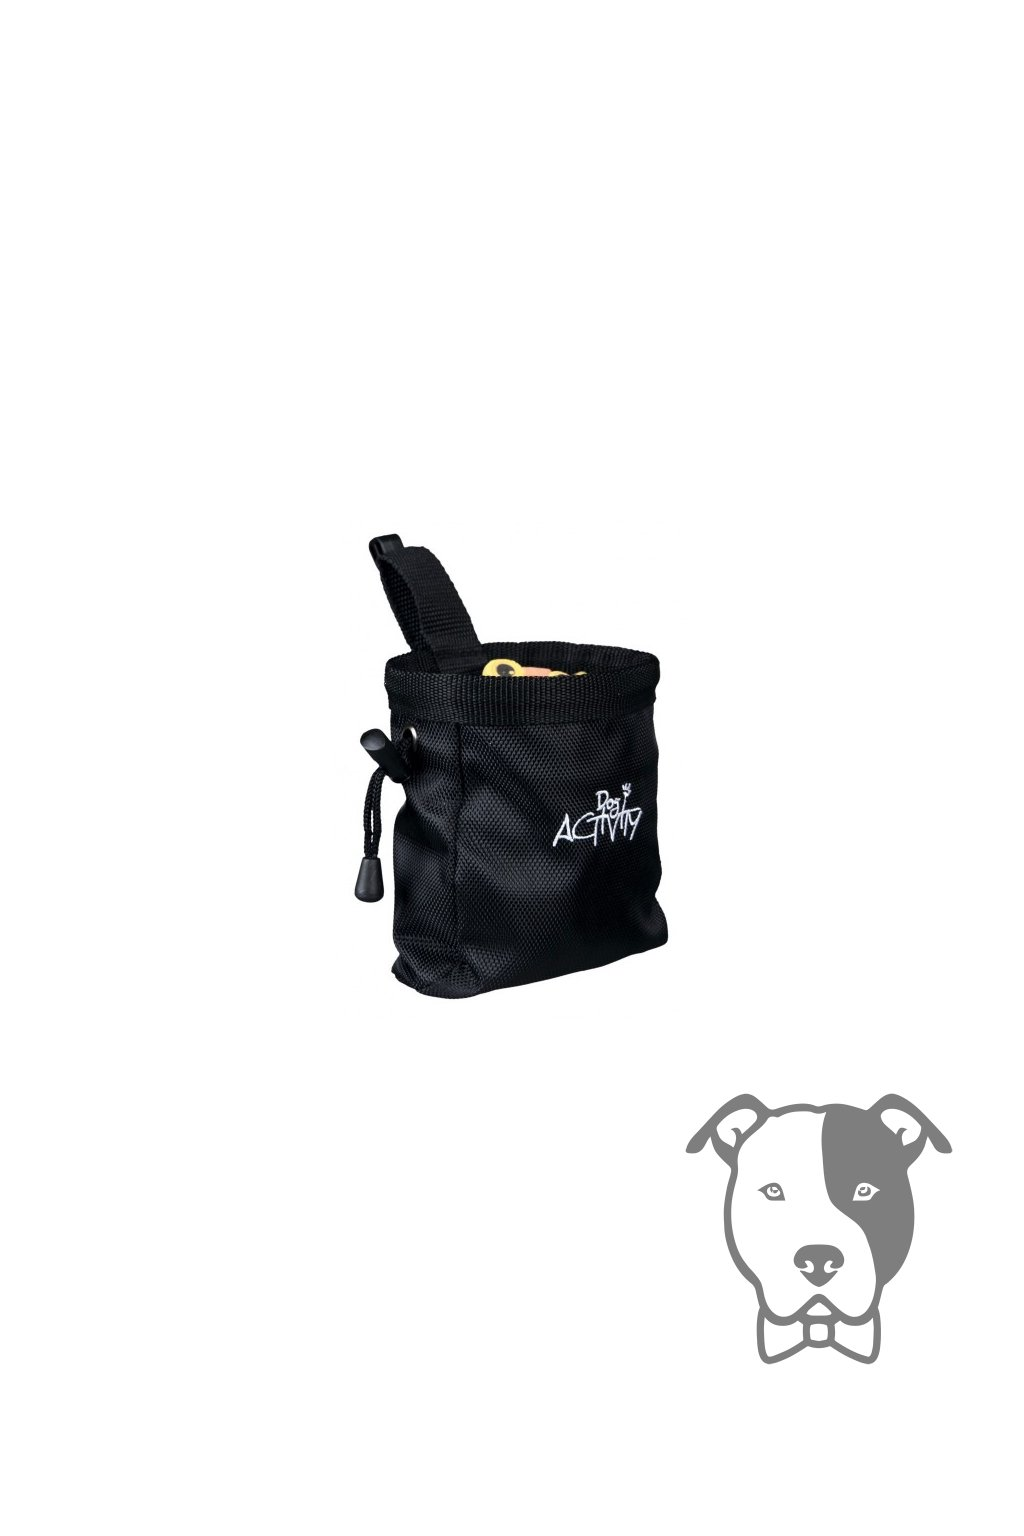 trixie snack beutel dog activity baggy deluxe 10x14 schwarz 720x600